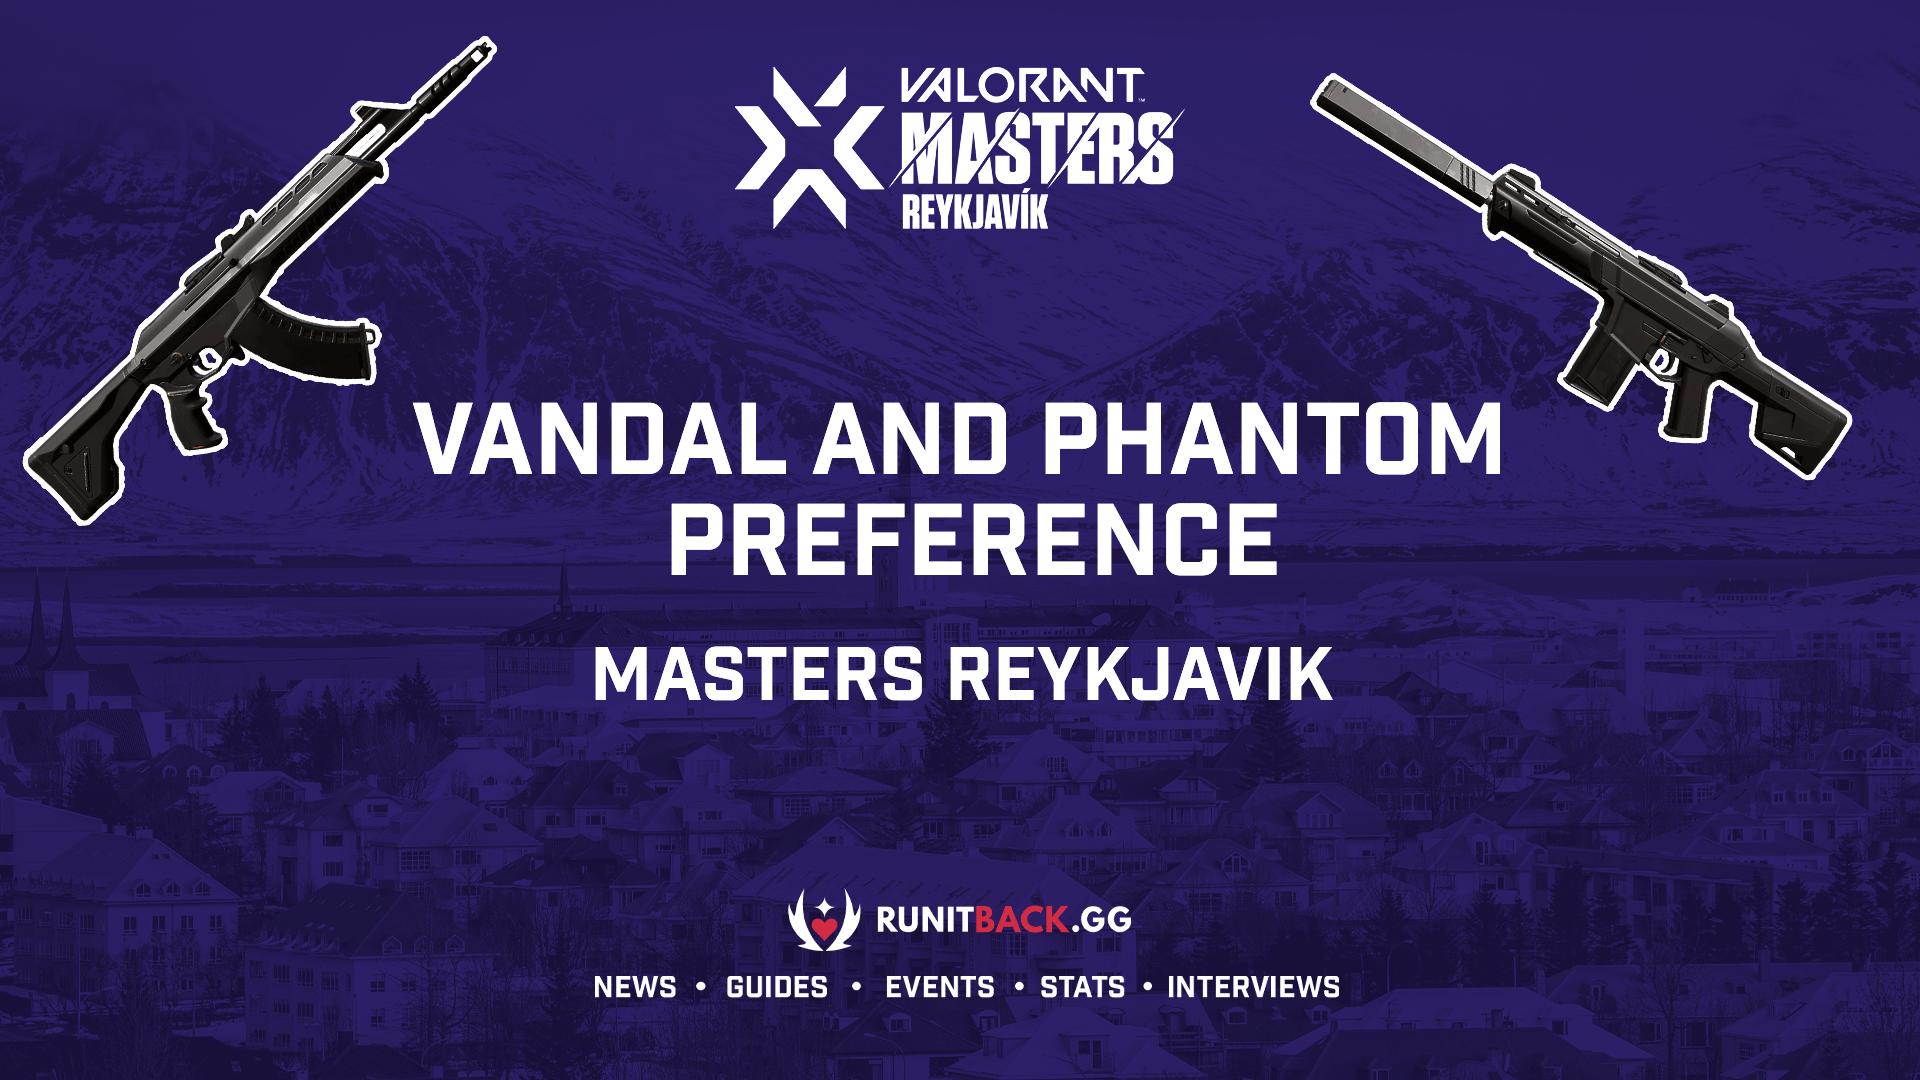 Vandal and Phantom preference of each player at Masters Reykjavik